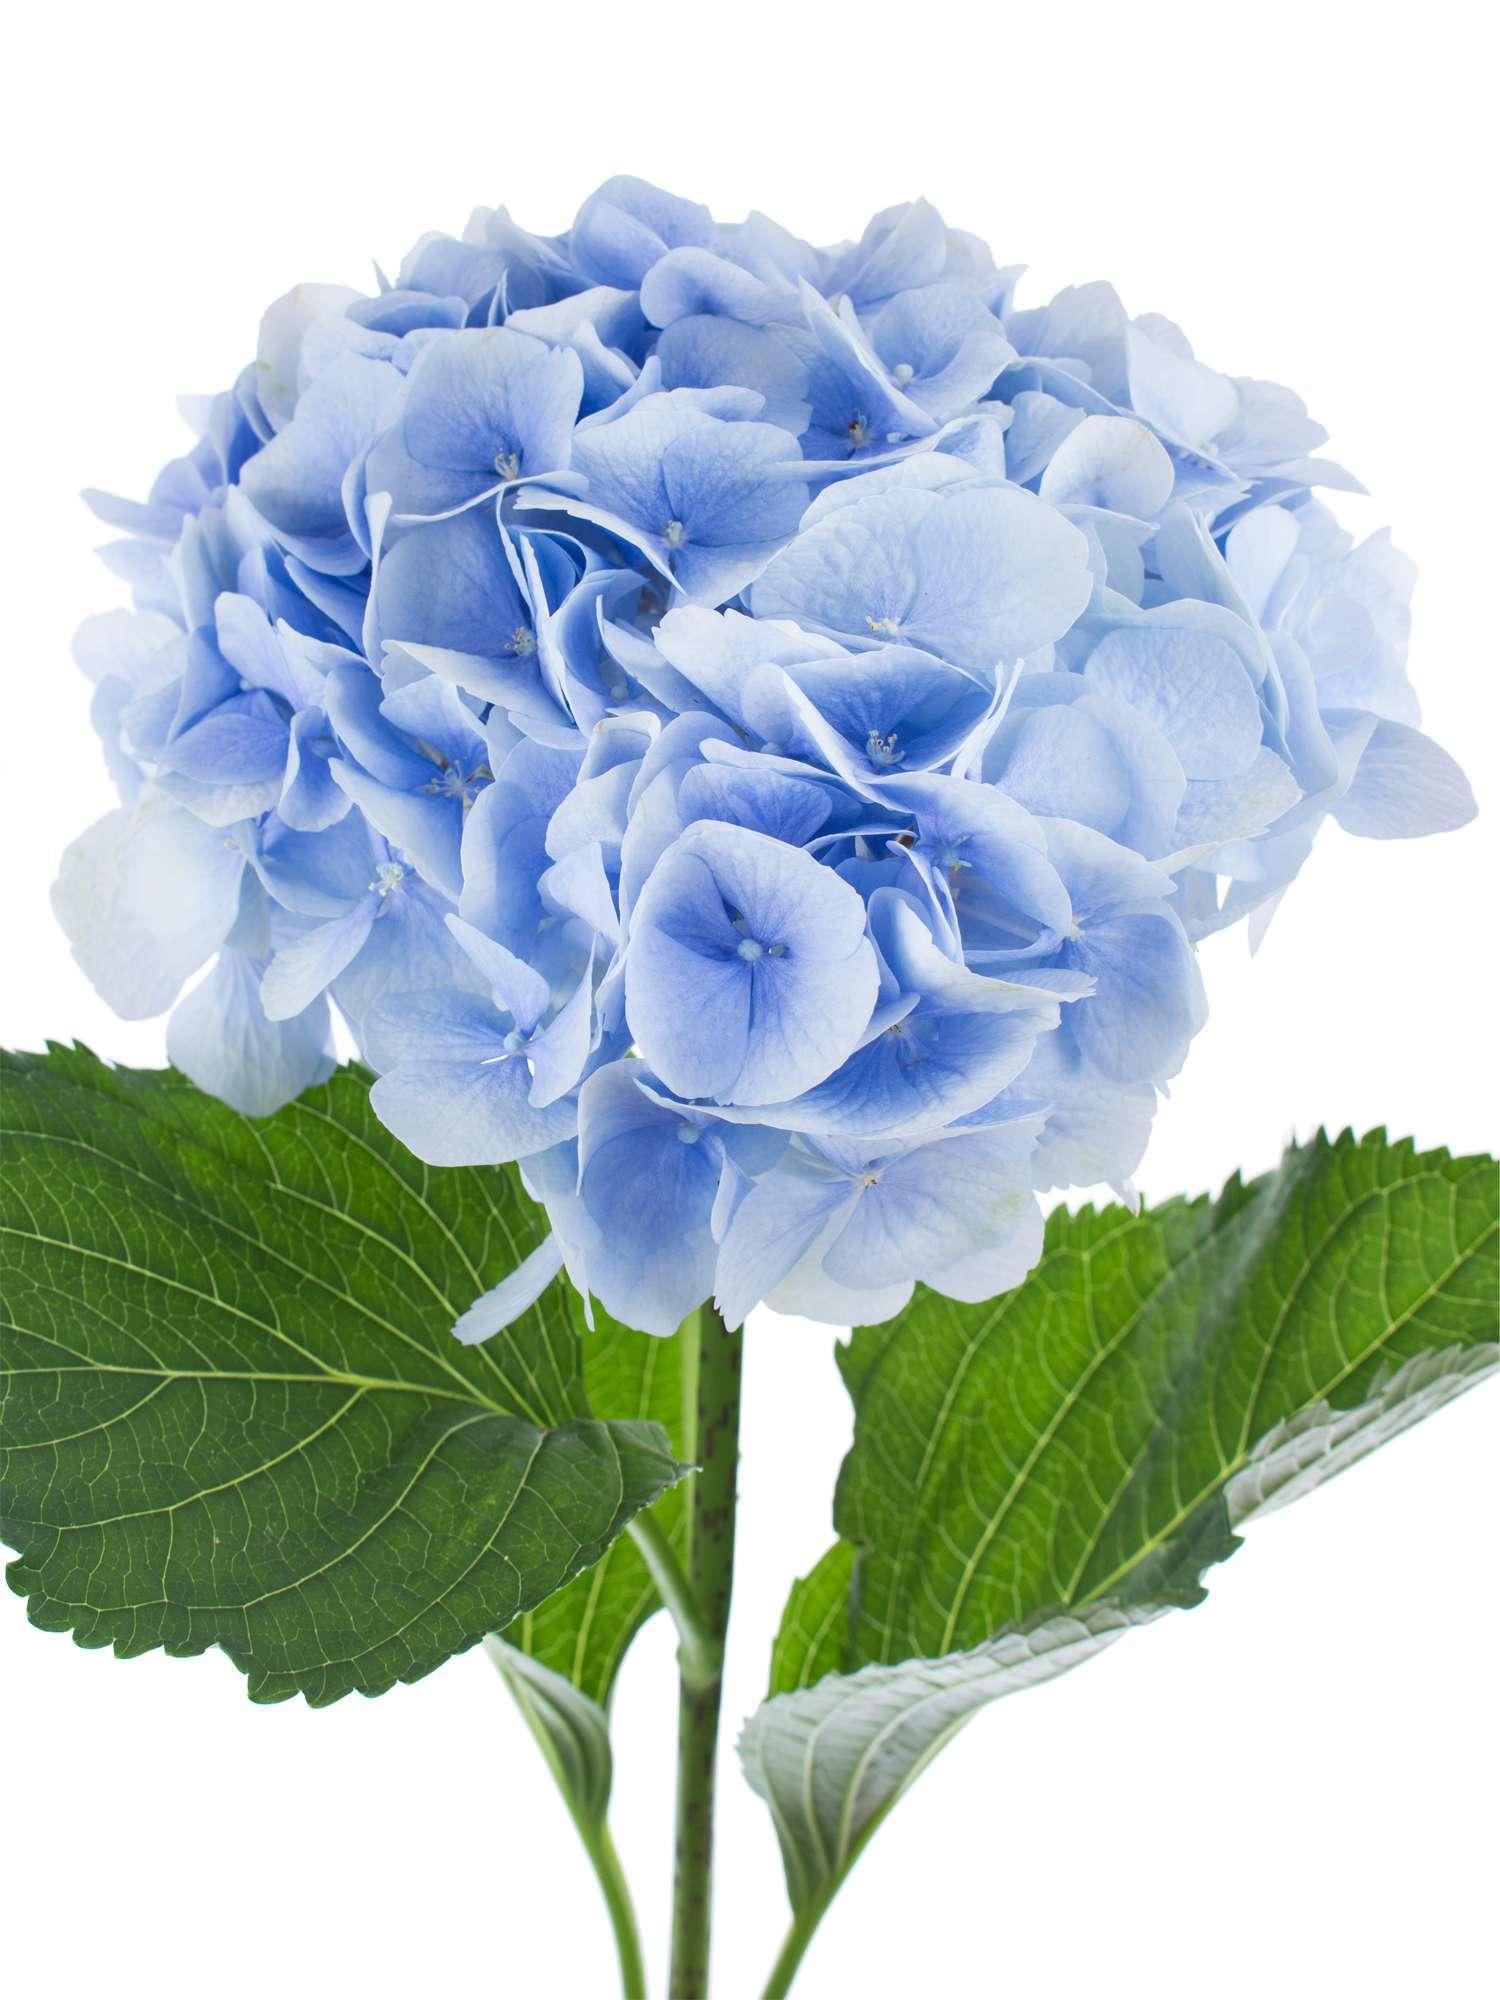 hortensie blau panoramio photo of hortensie in blau blue hydrangea hortensie blau hortensie. Black Bedroom Furniture Sets. Home Design Ideas